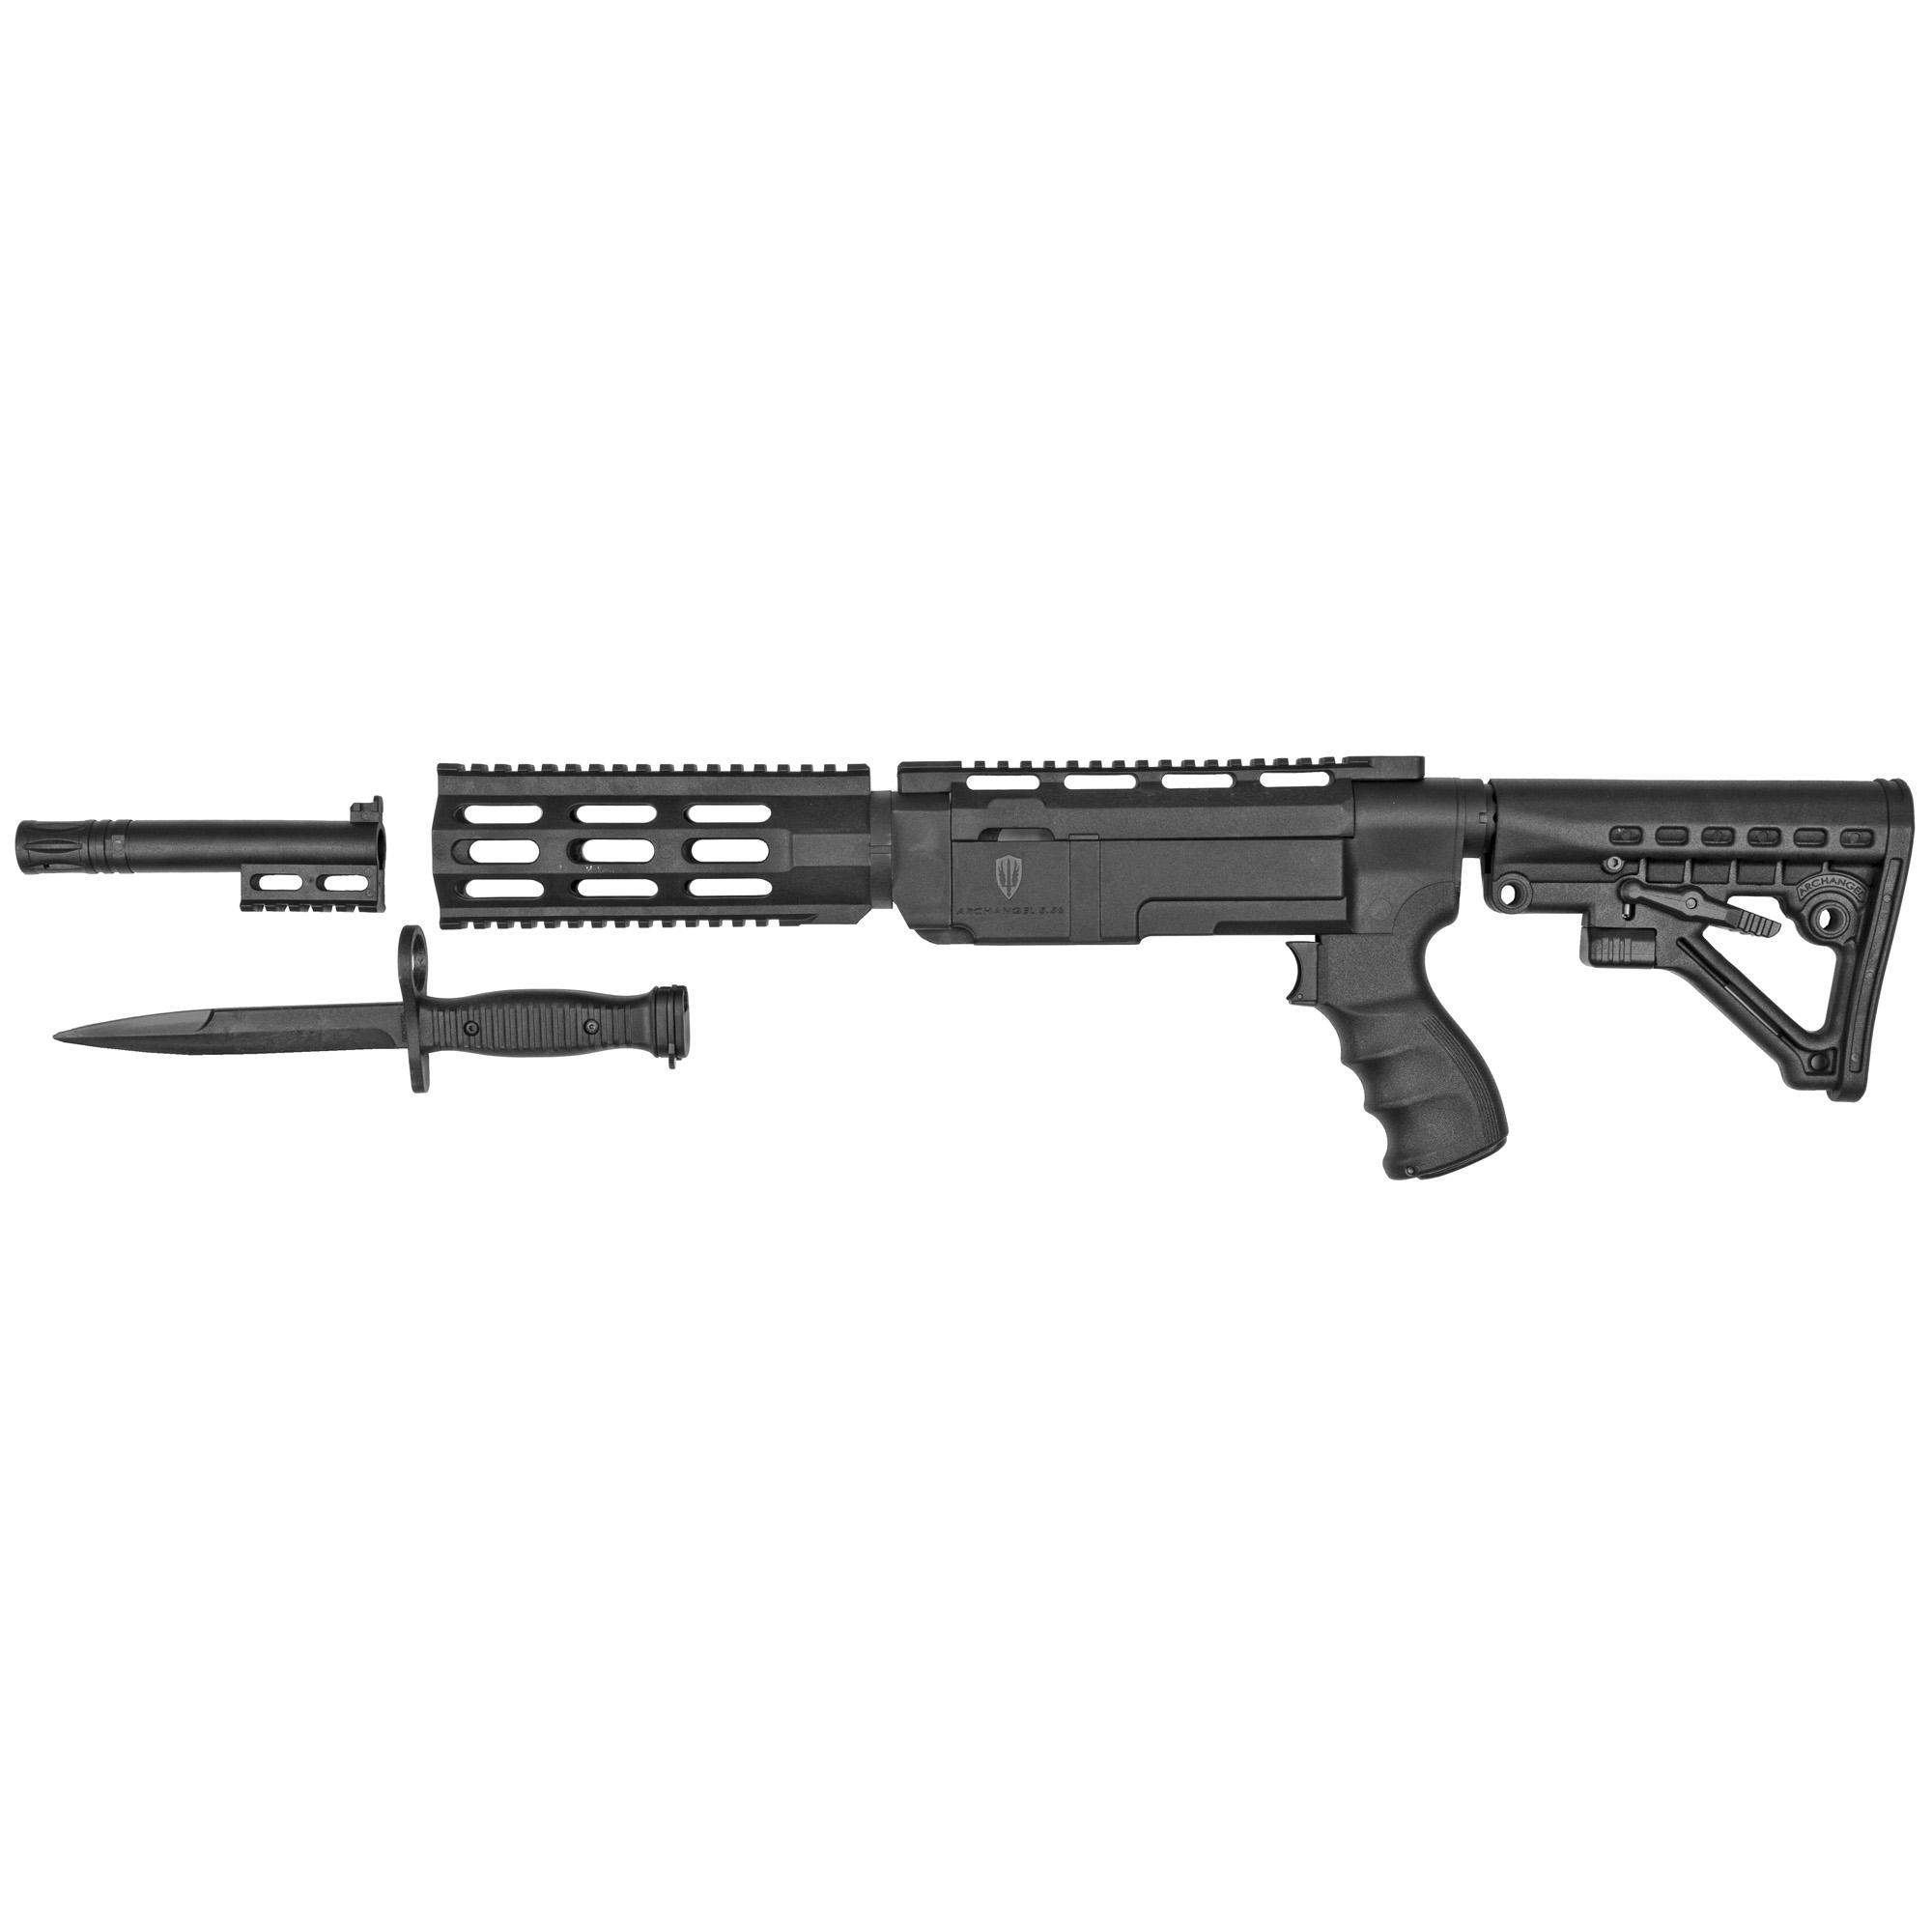 Archangel 10/22 Ars Rifle Pkg 6-pos